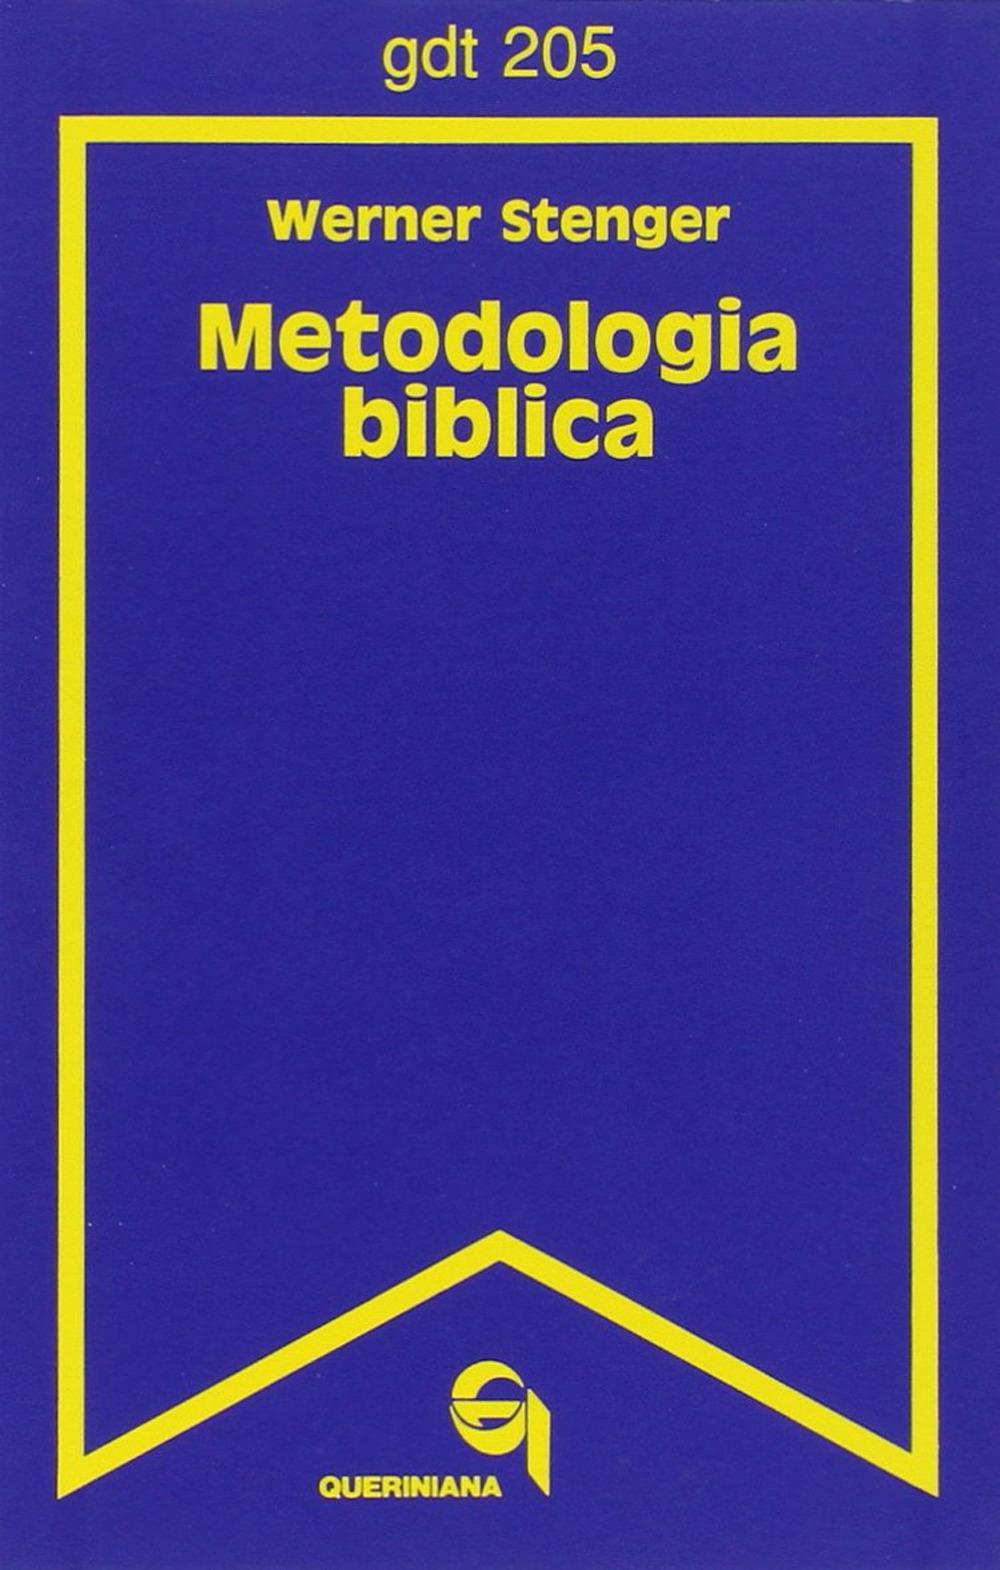 Metodologia biblica